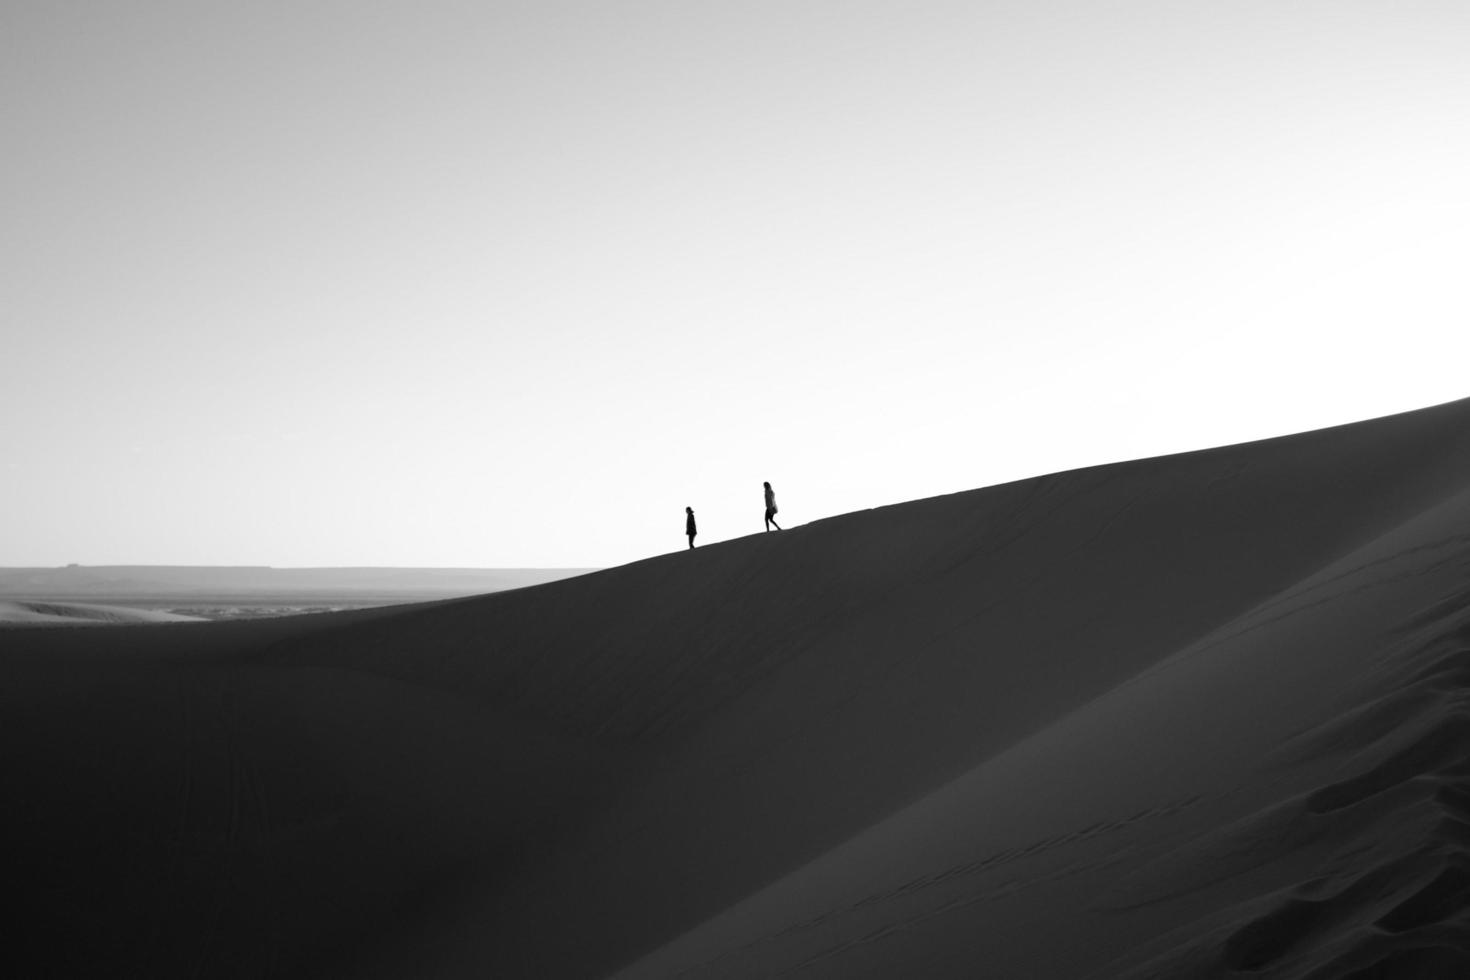 Silhouette of two people walking on desert ridge photo